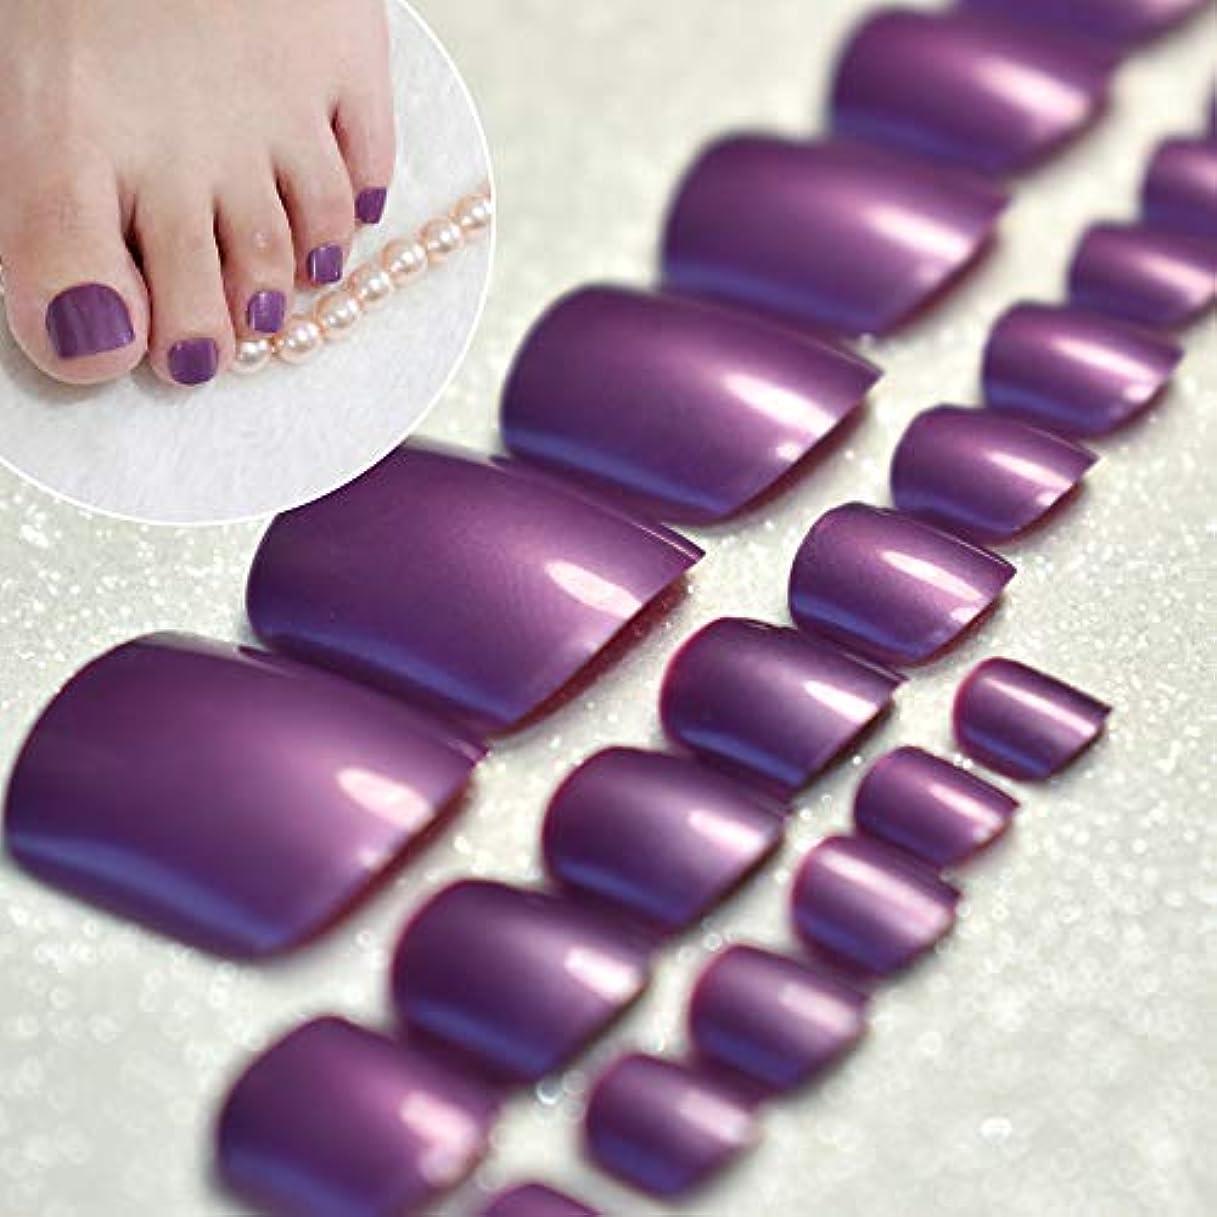 XUTXZKA 足の爪のためのきらめく光沢のあるグレープパープルネイルのヒント足のためのお菓子祭りの偽の足指24本